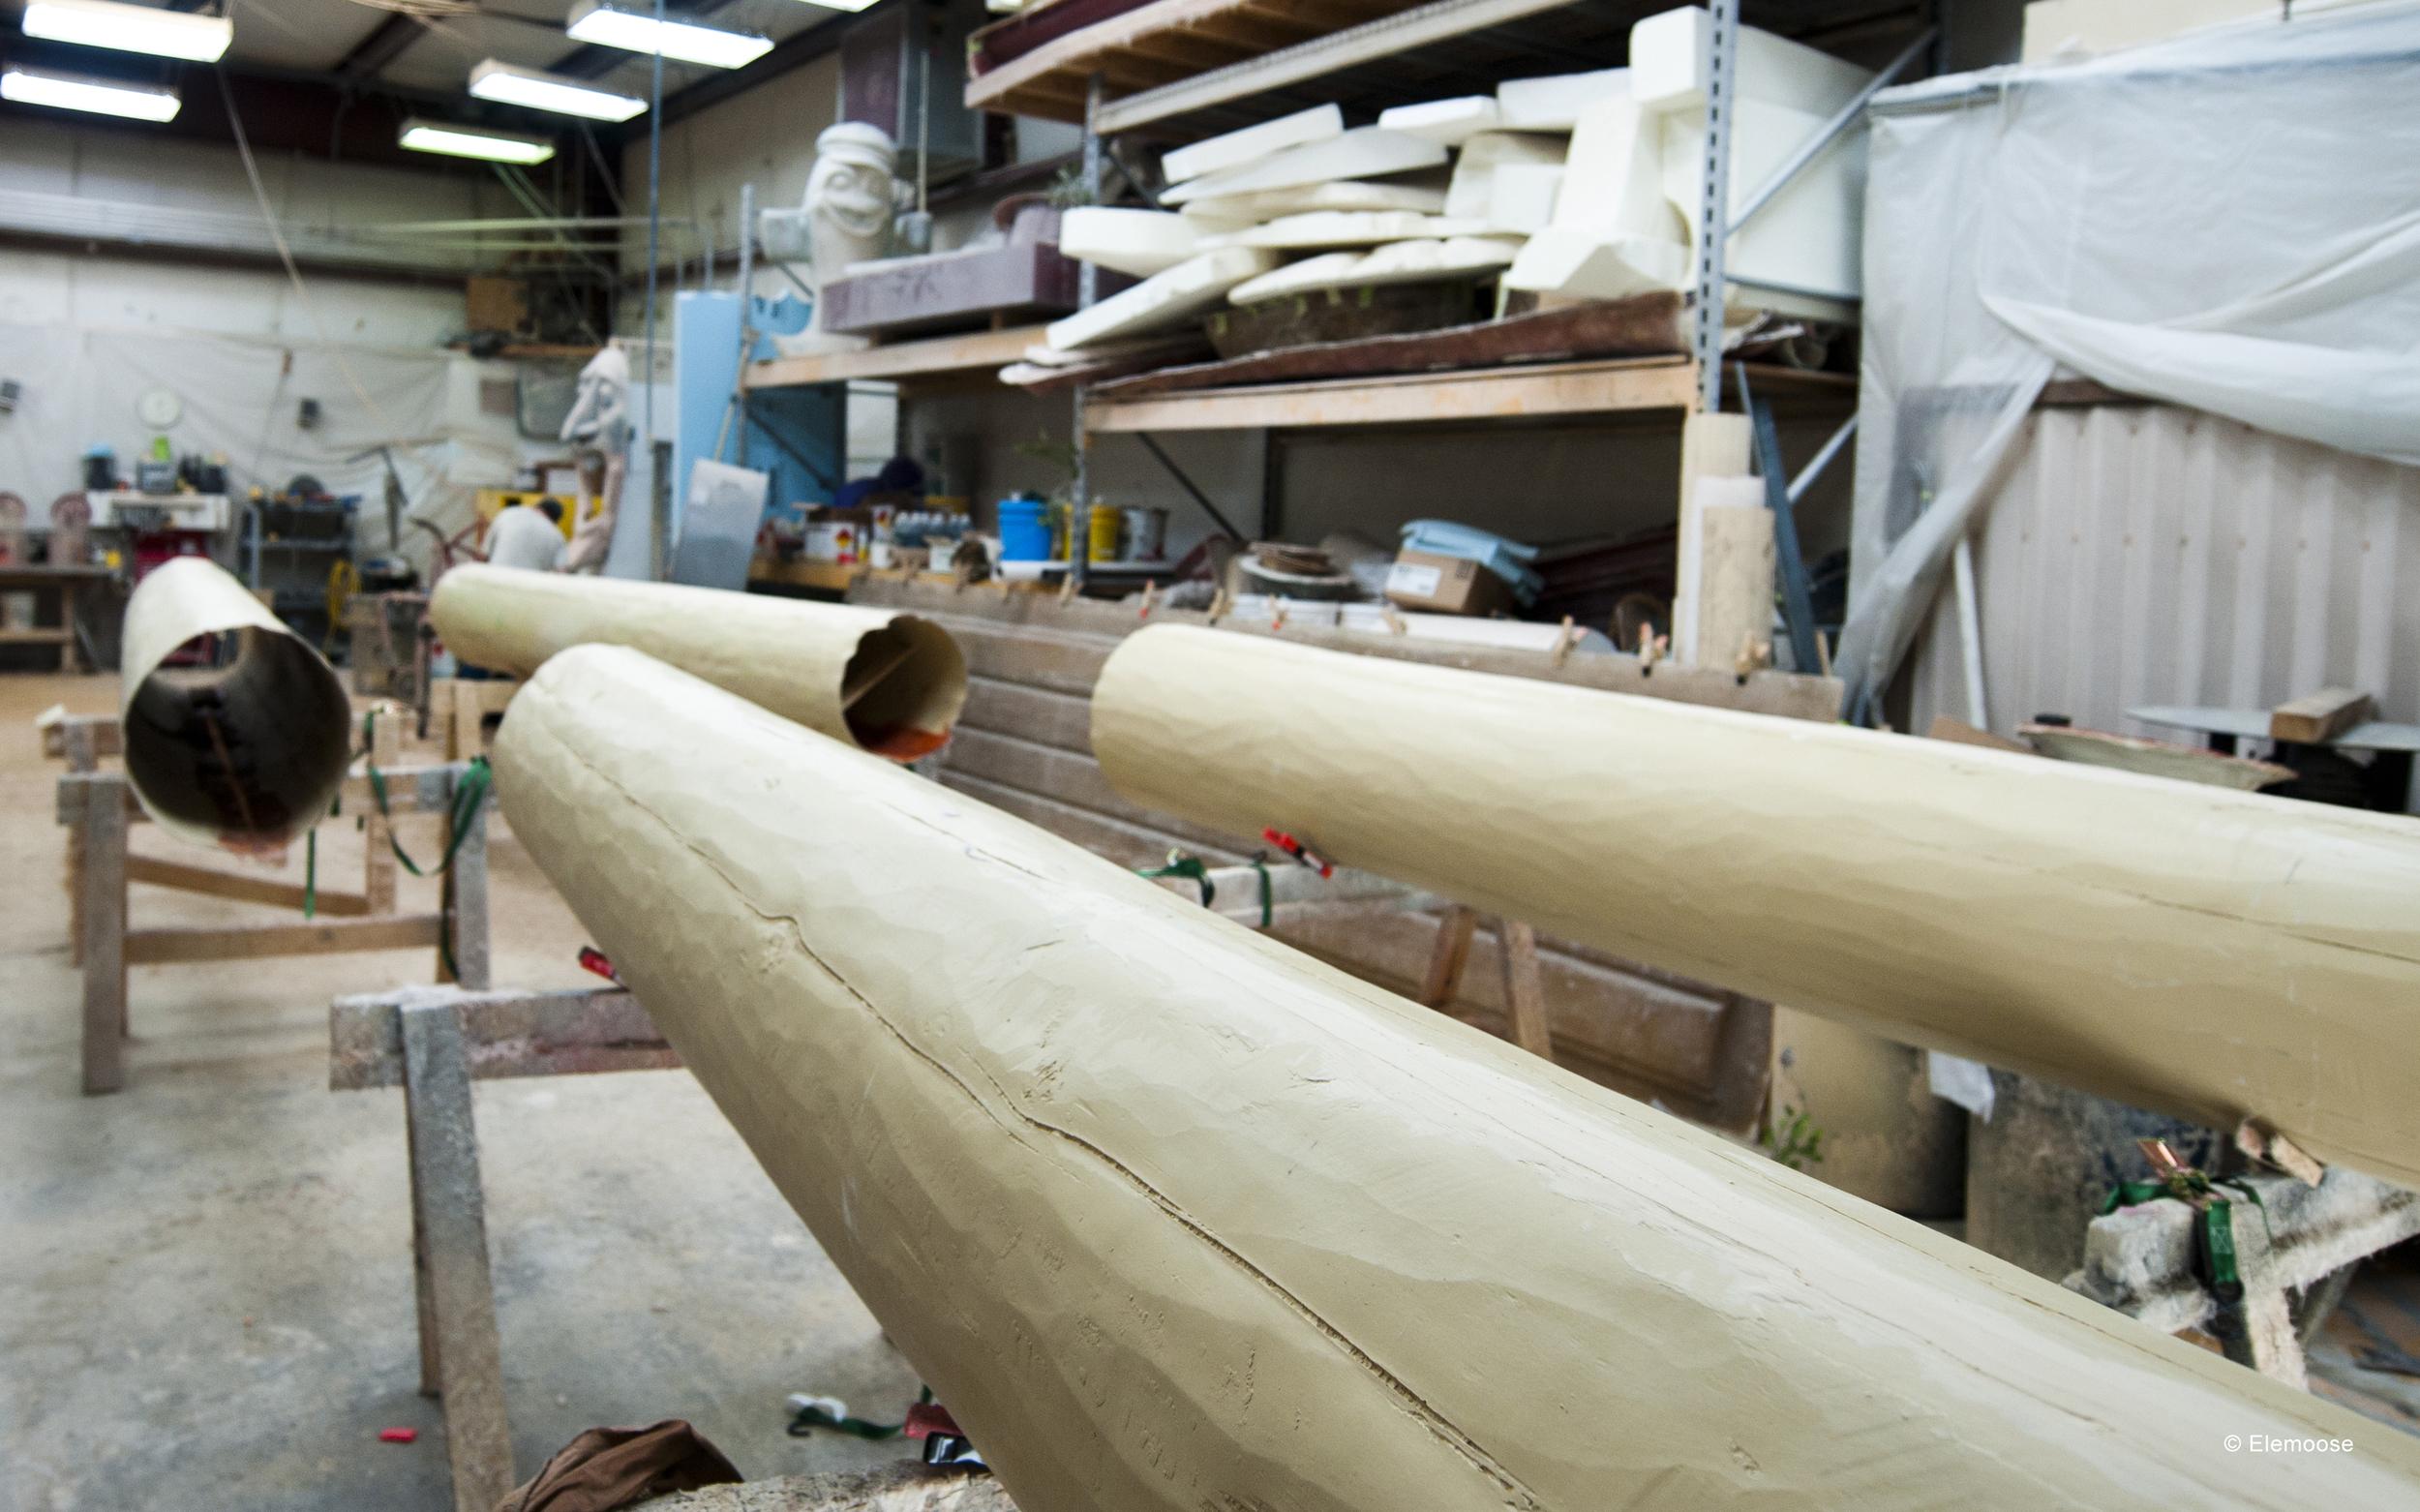 custom-fiberglass-logs-pine-finish-bass-pro-shops.jpg